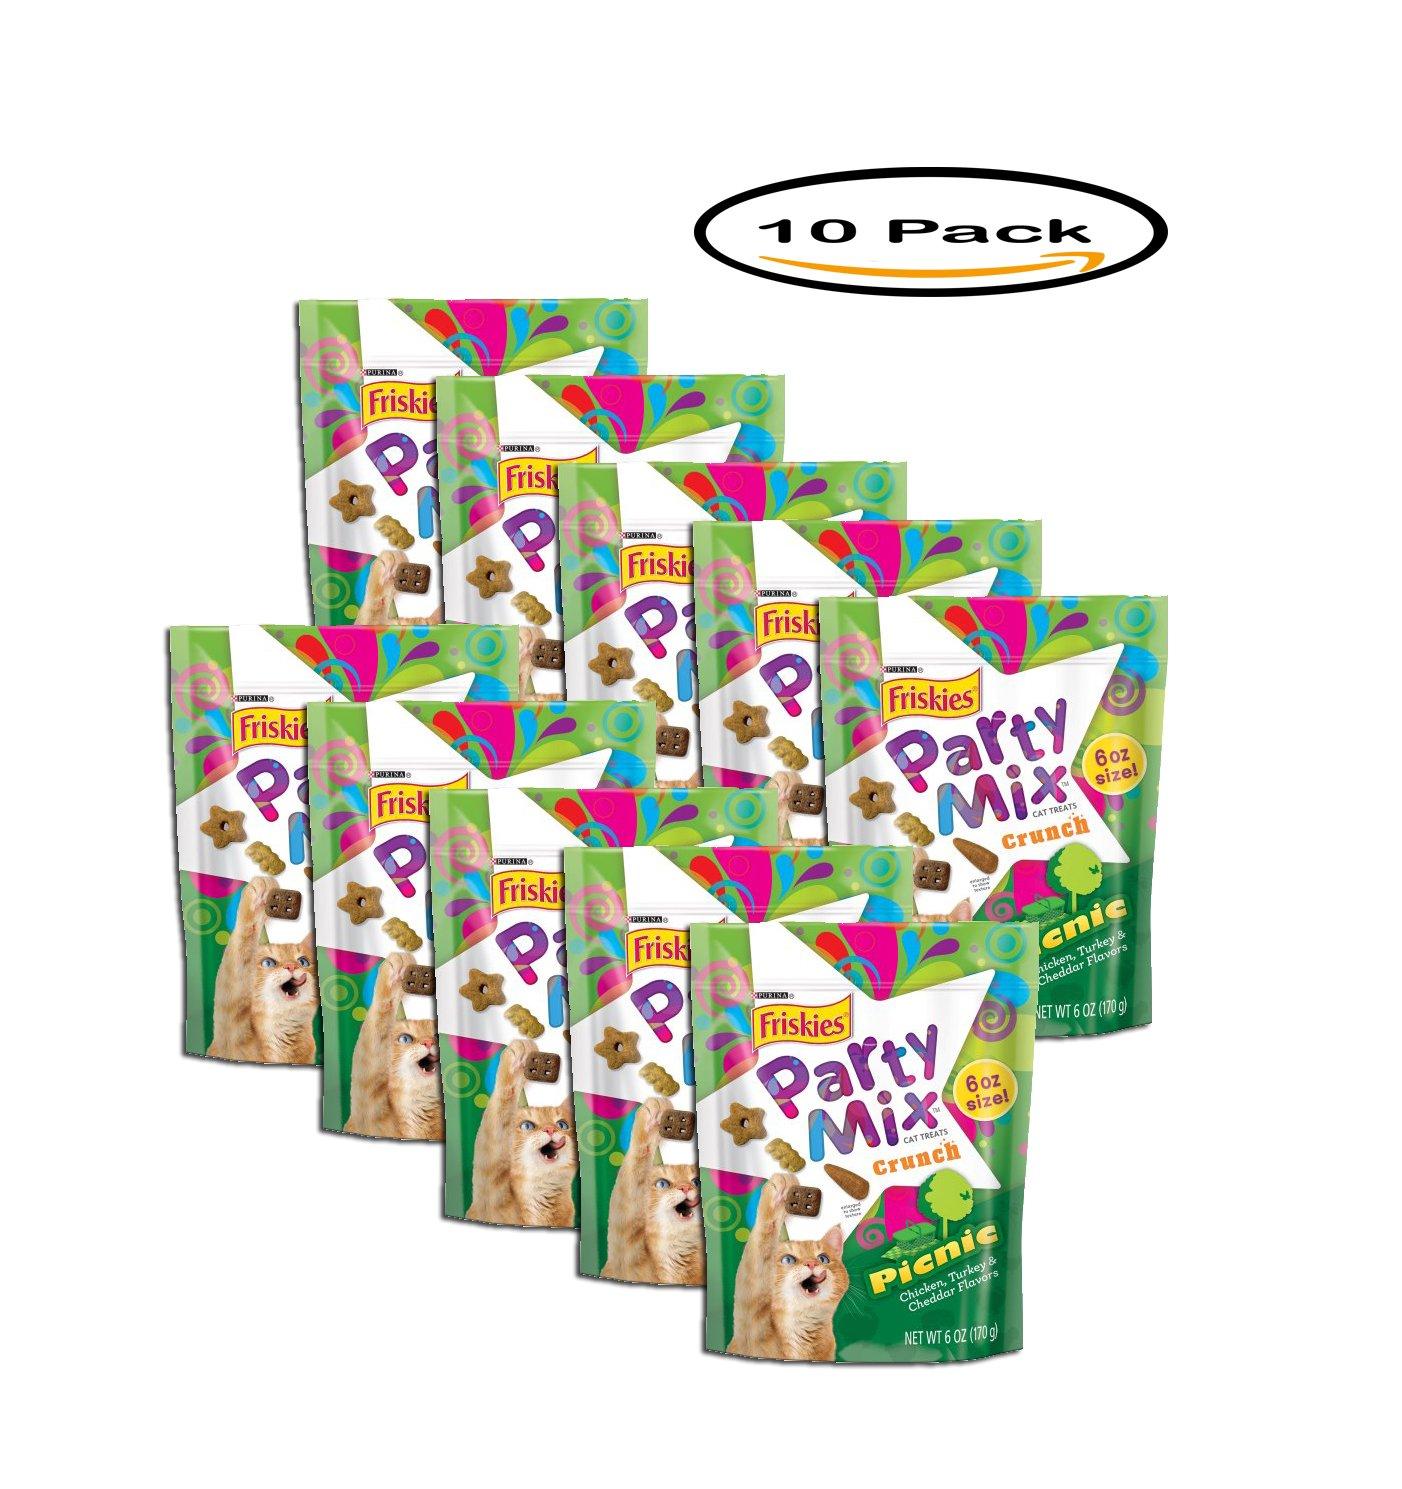 PACK OF 10 - Purina Friskies Party Mix Crunch Picnic Cat Treats, 6 oz